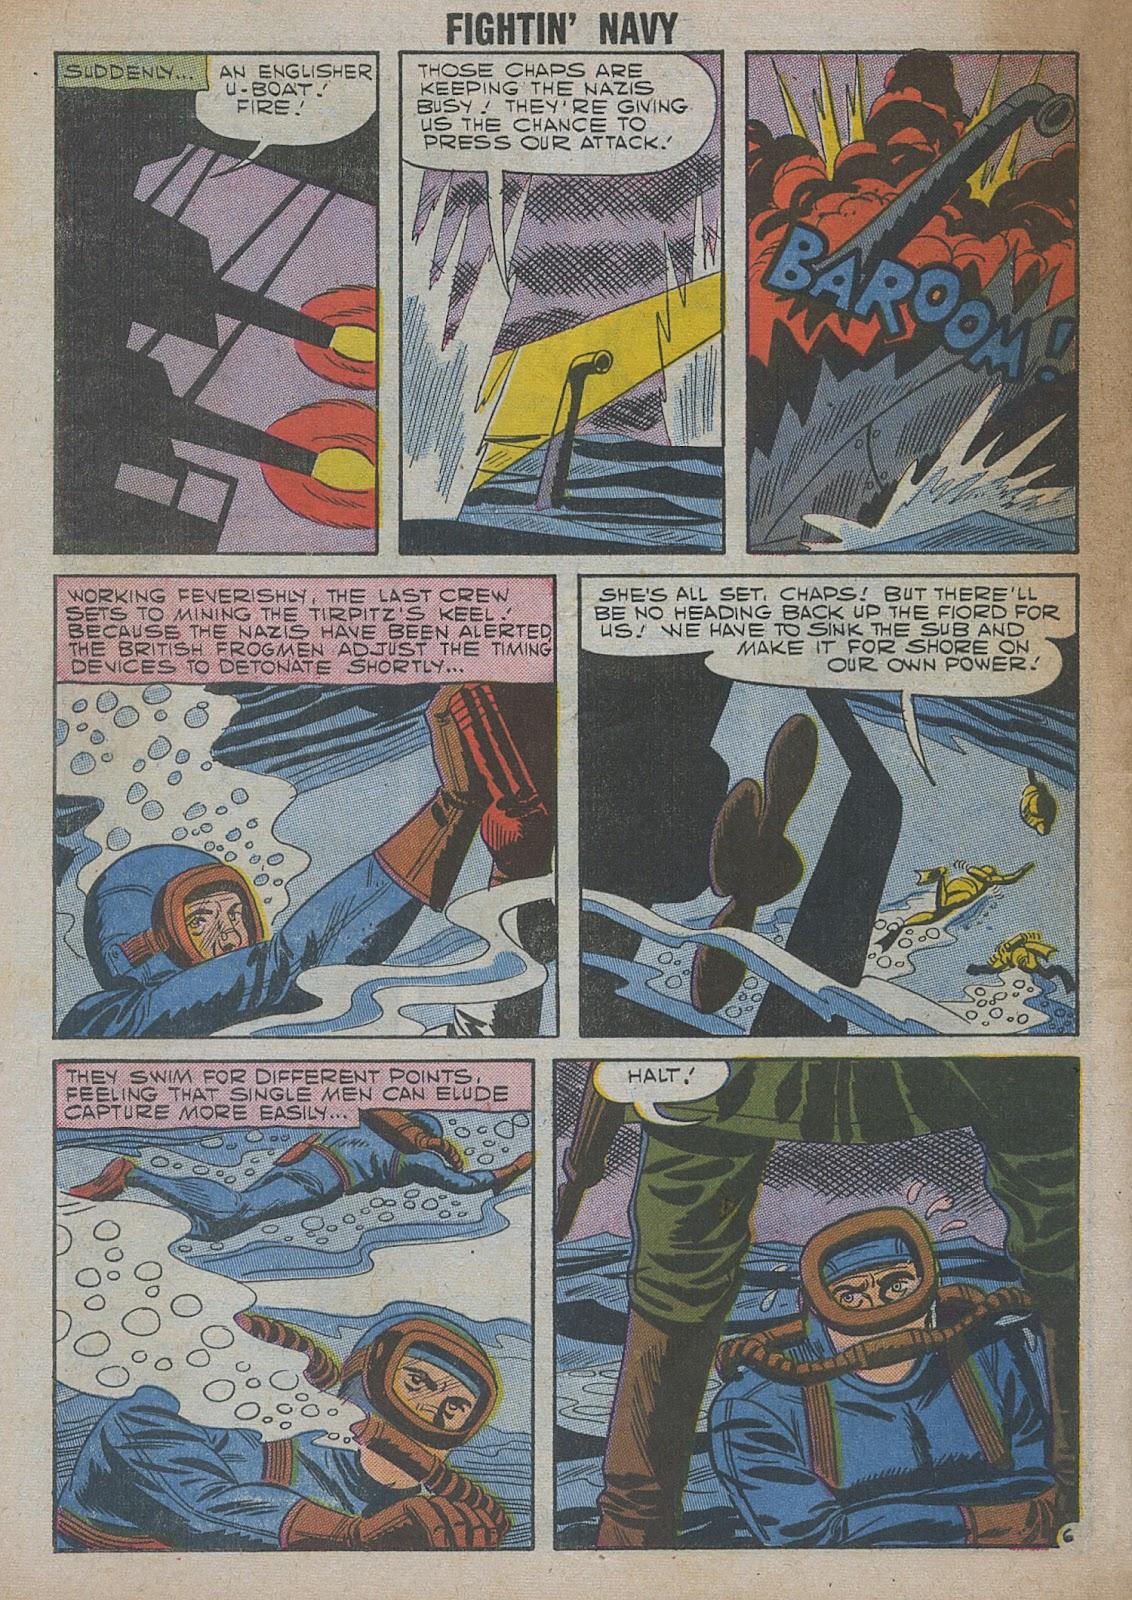 Read online Fightin' Navy comic -  Issue #82 - 64